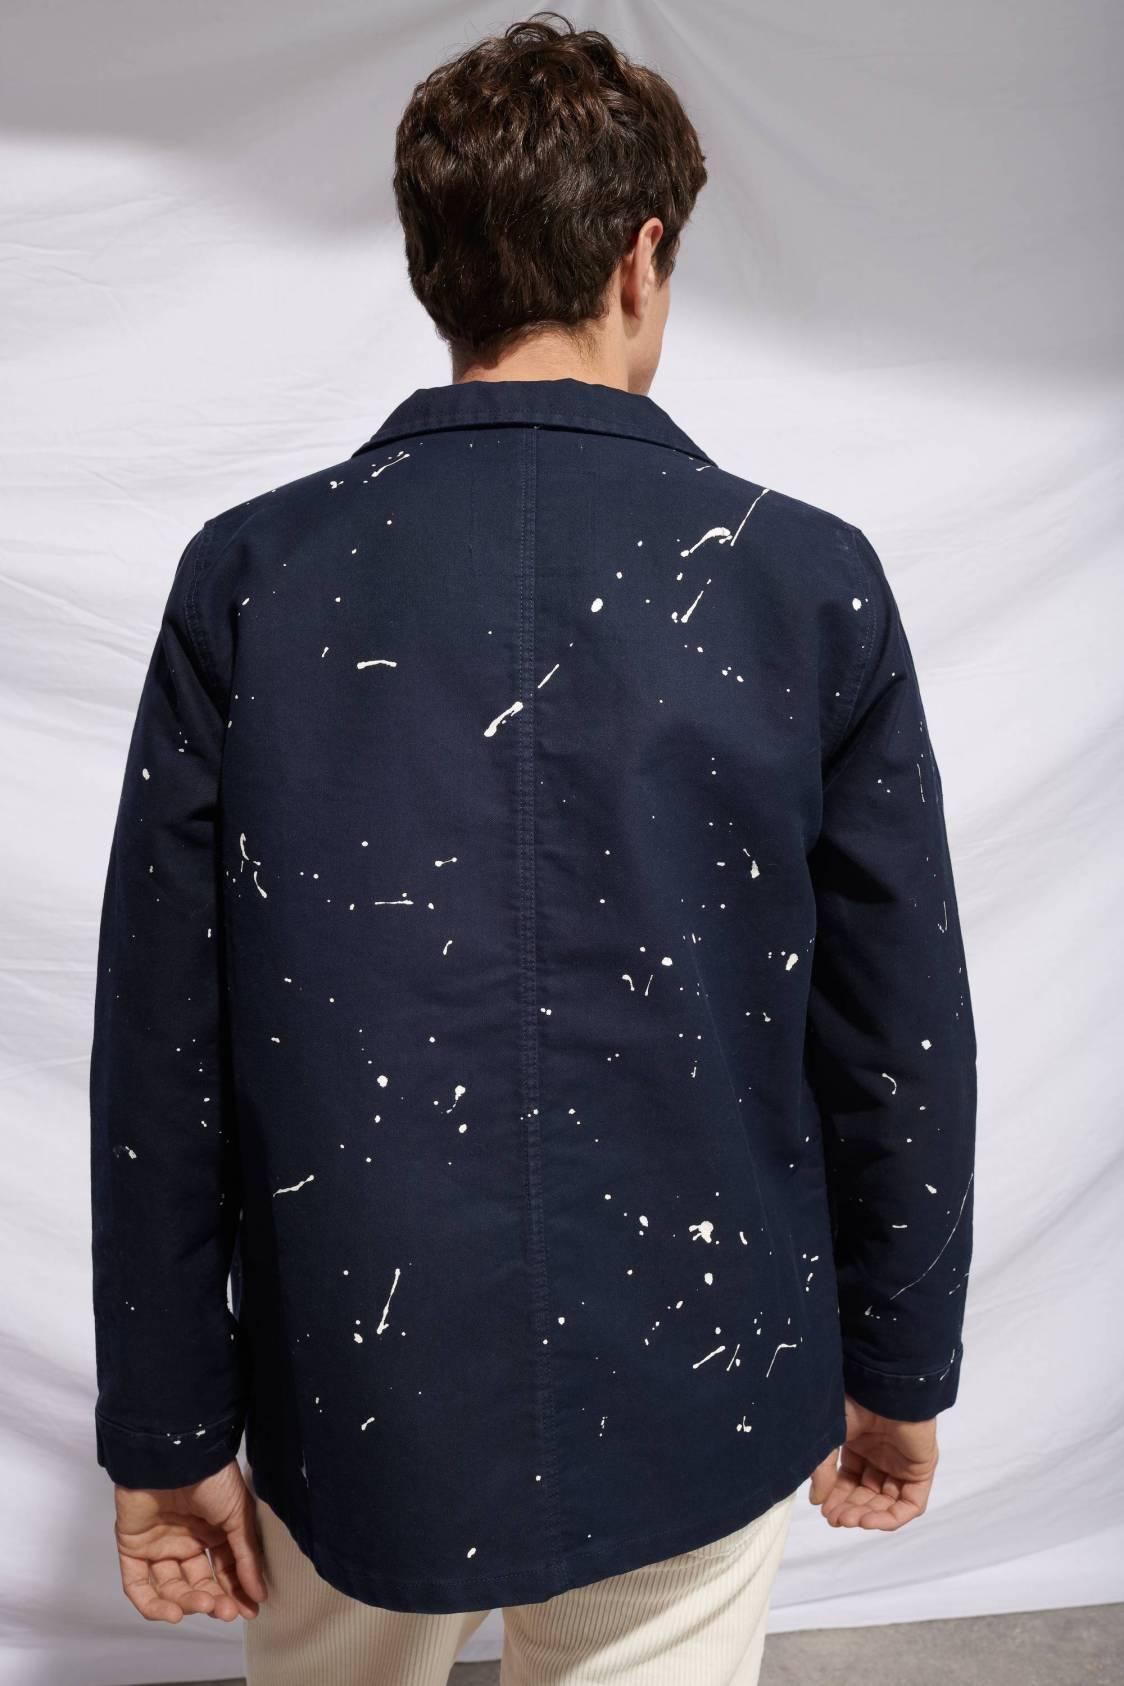 Painter Work Jacket